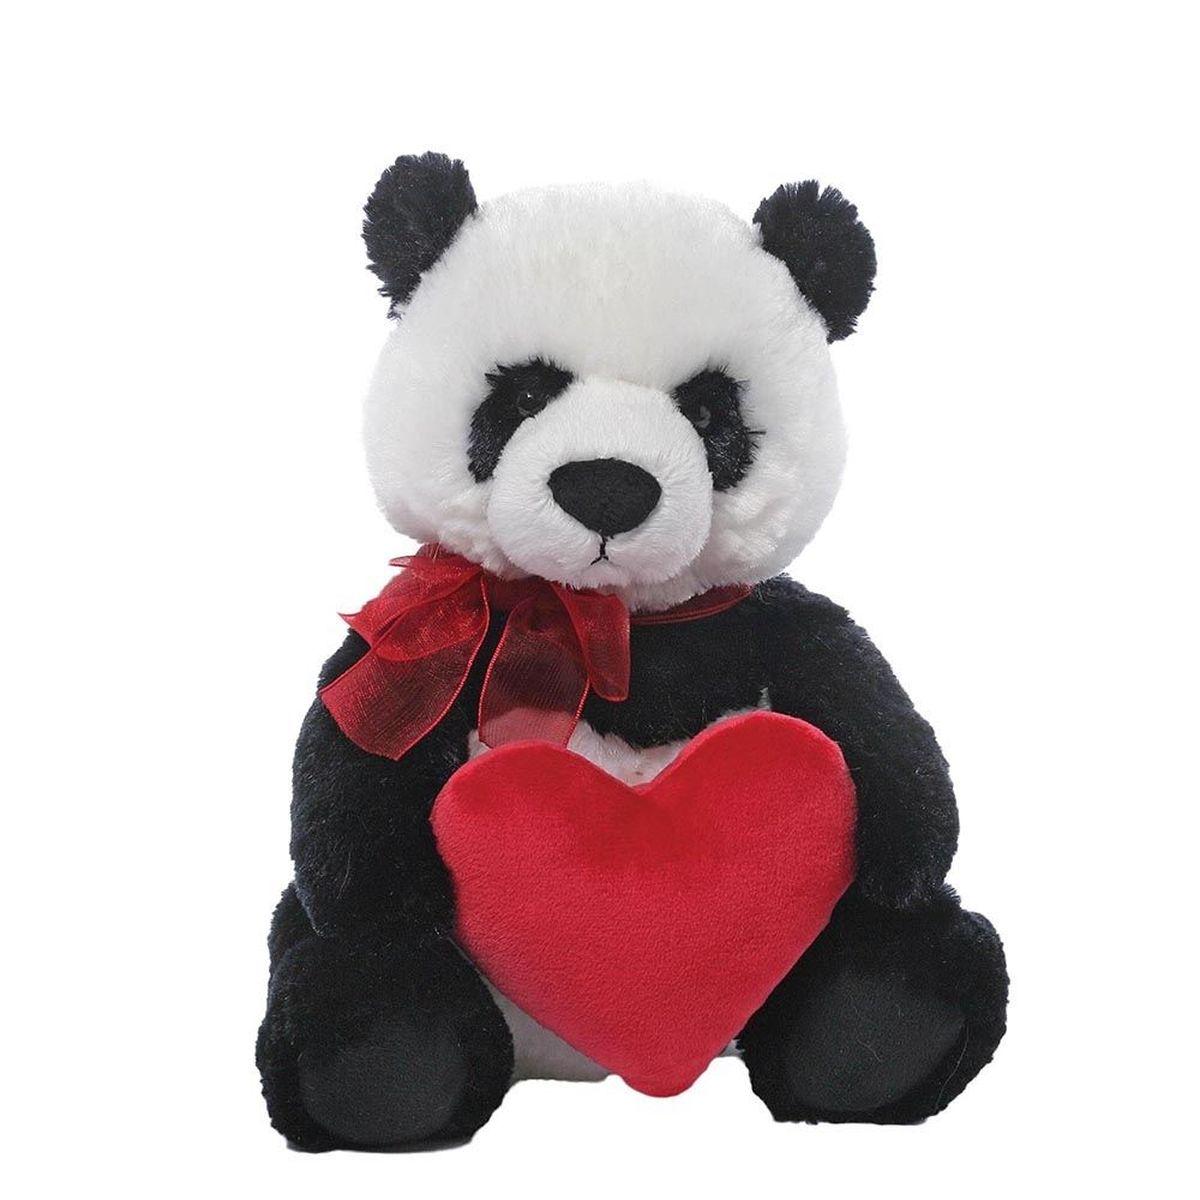 Gund Мягкая игрушка Pandalove 21,5 см